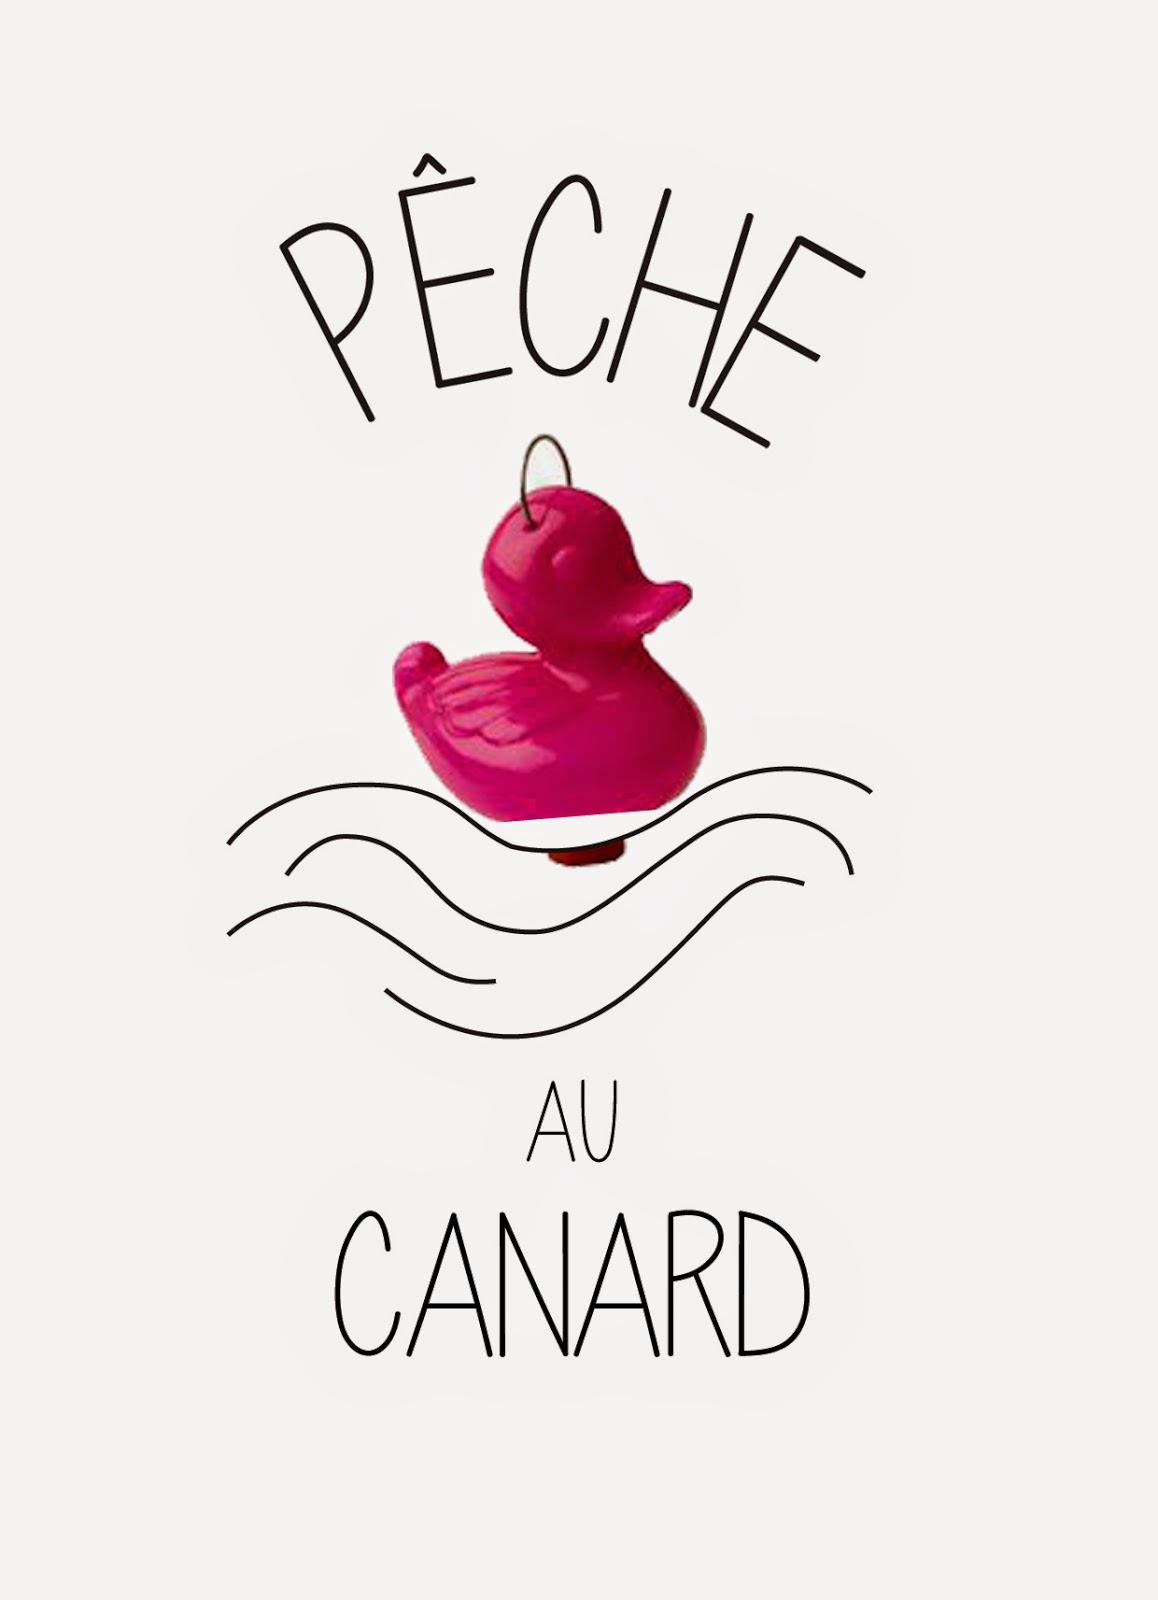 Mother like la p che au canard - Dessin peche aux canards ...